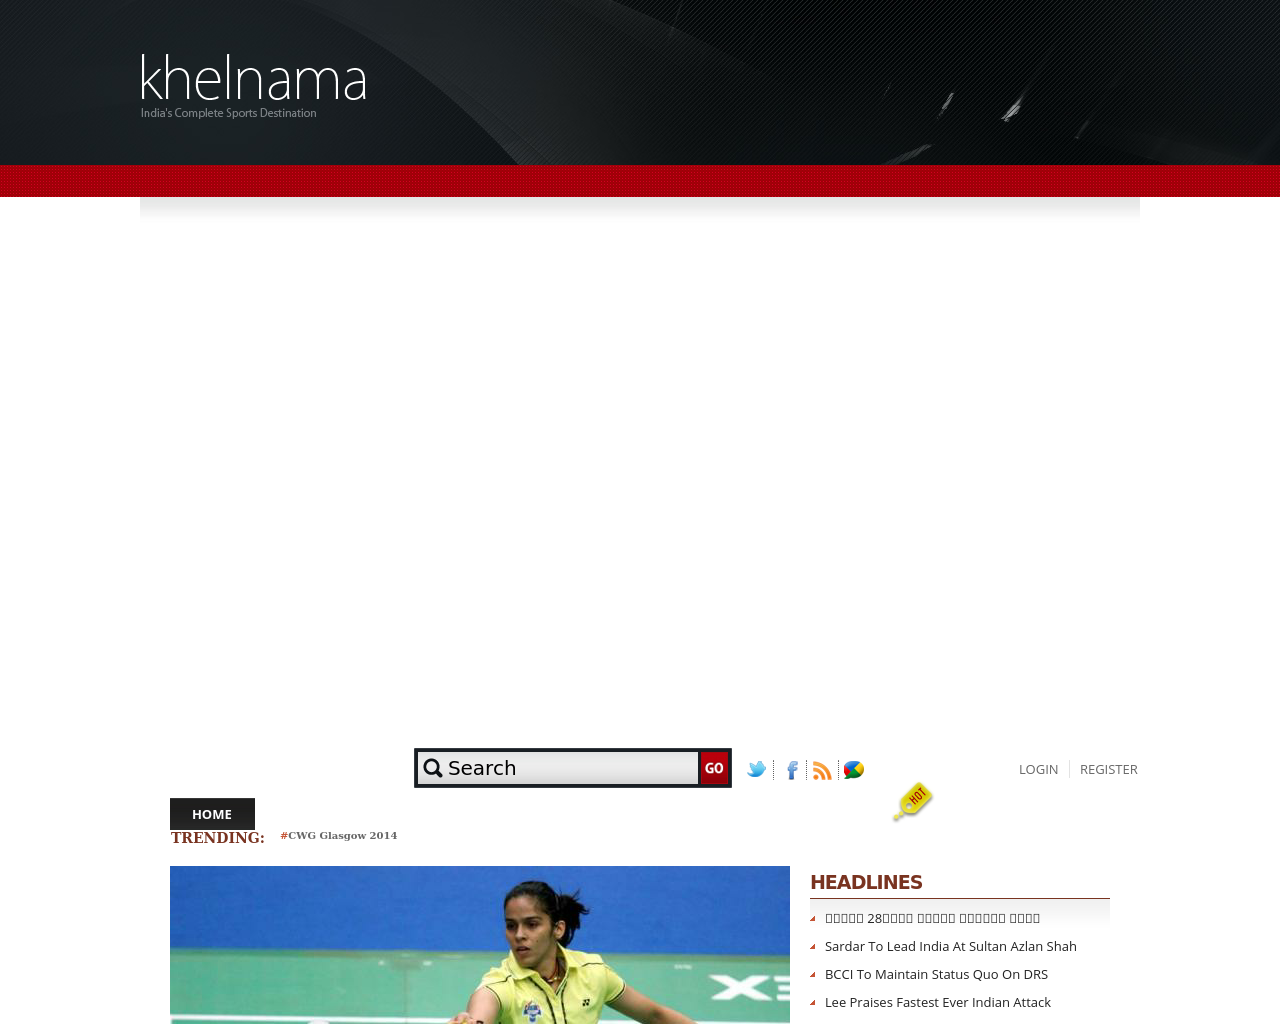 Khelnama-Advertising-Reviews-Pricing